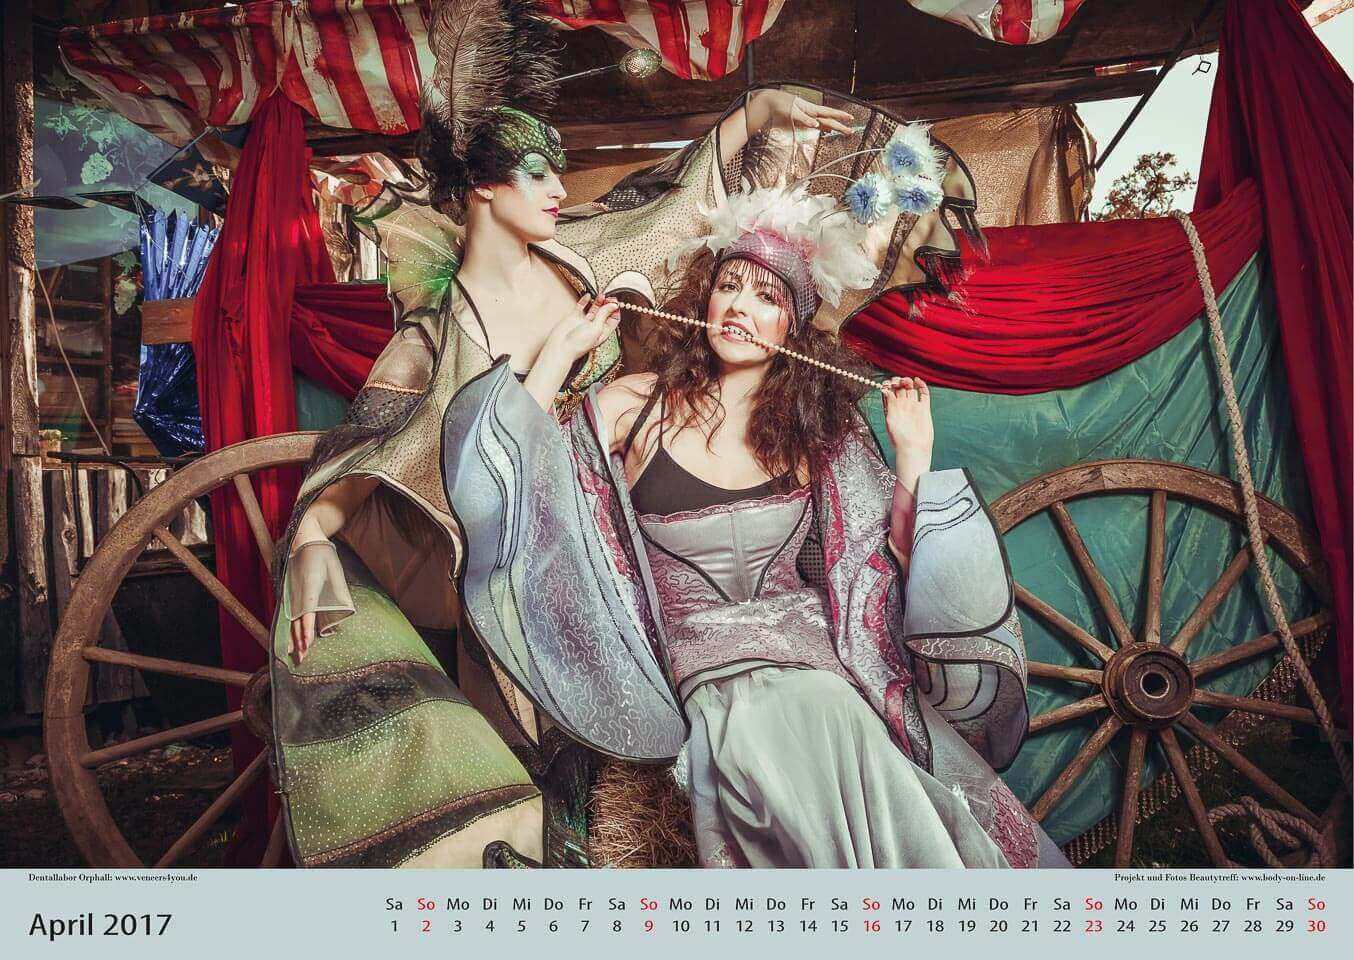 Fotograf-Fotostudio-Dresden-Zirkus-Shooting-Künstler-Artisten-Clown-Vorstellung-Styling-Make up-Unterhaltung